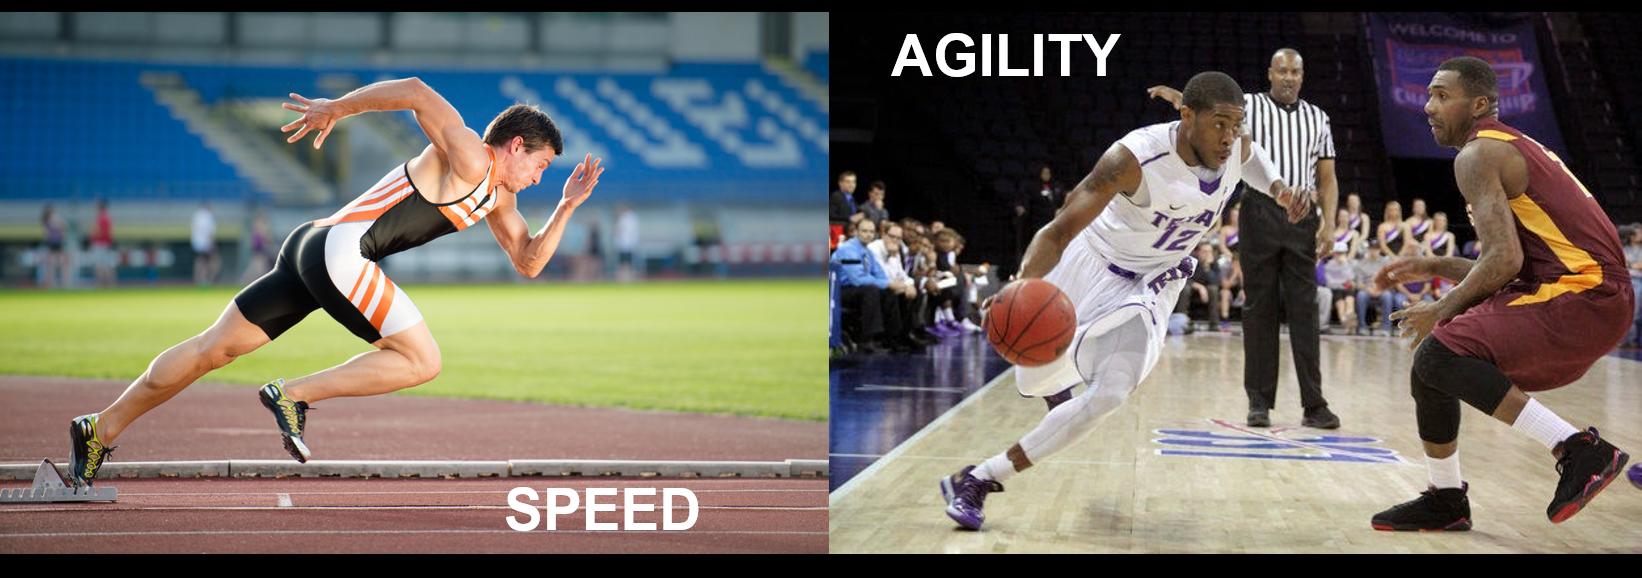 Speed vs Agility